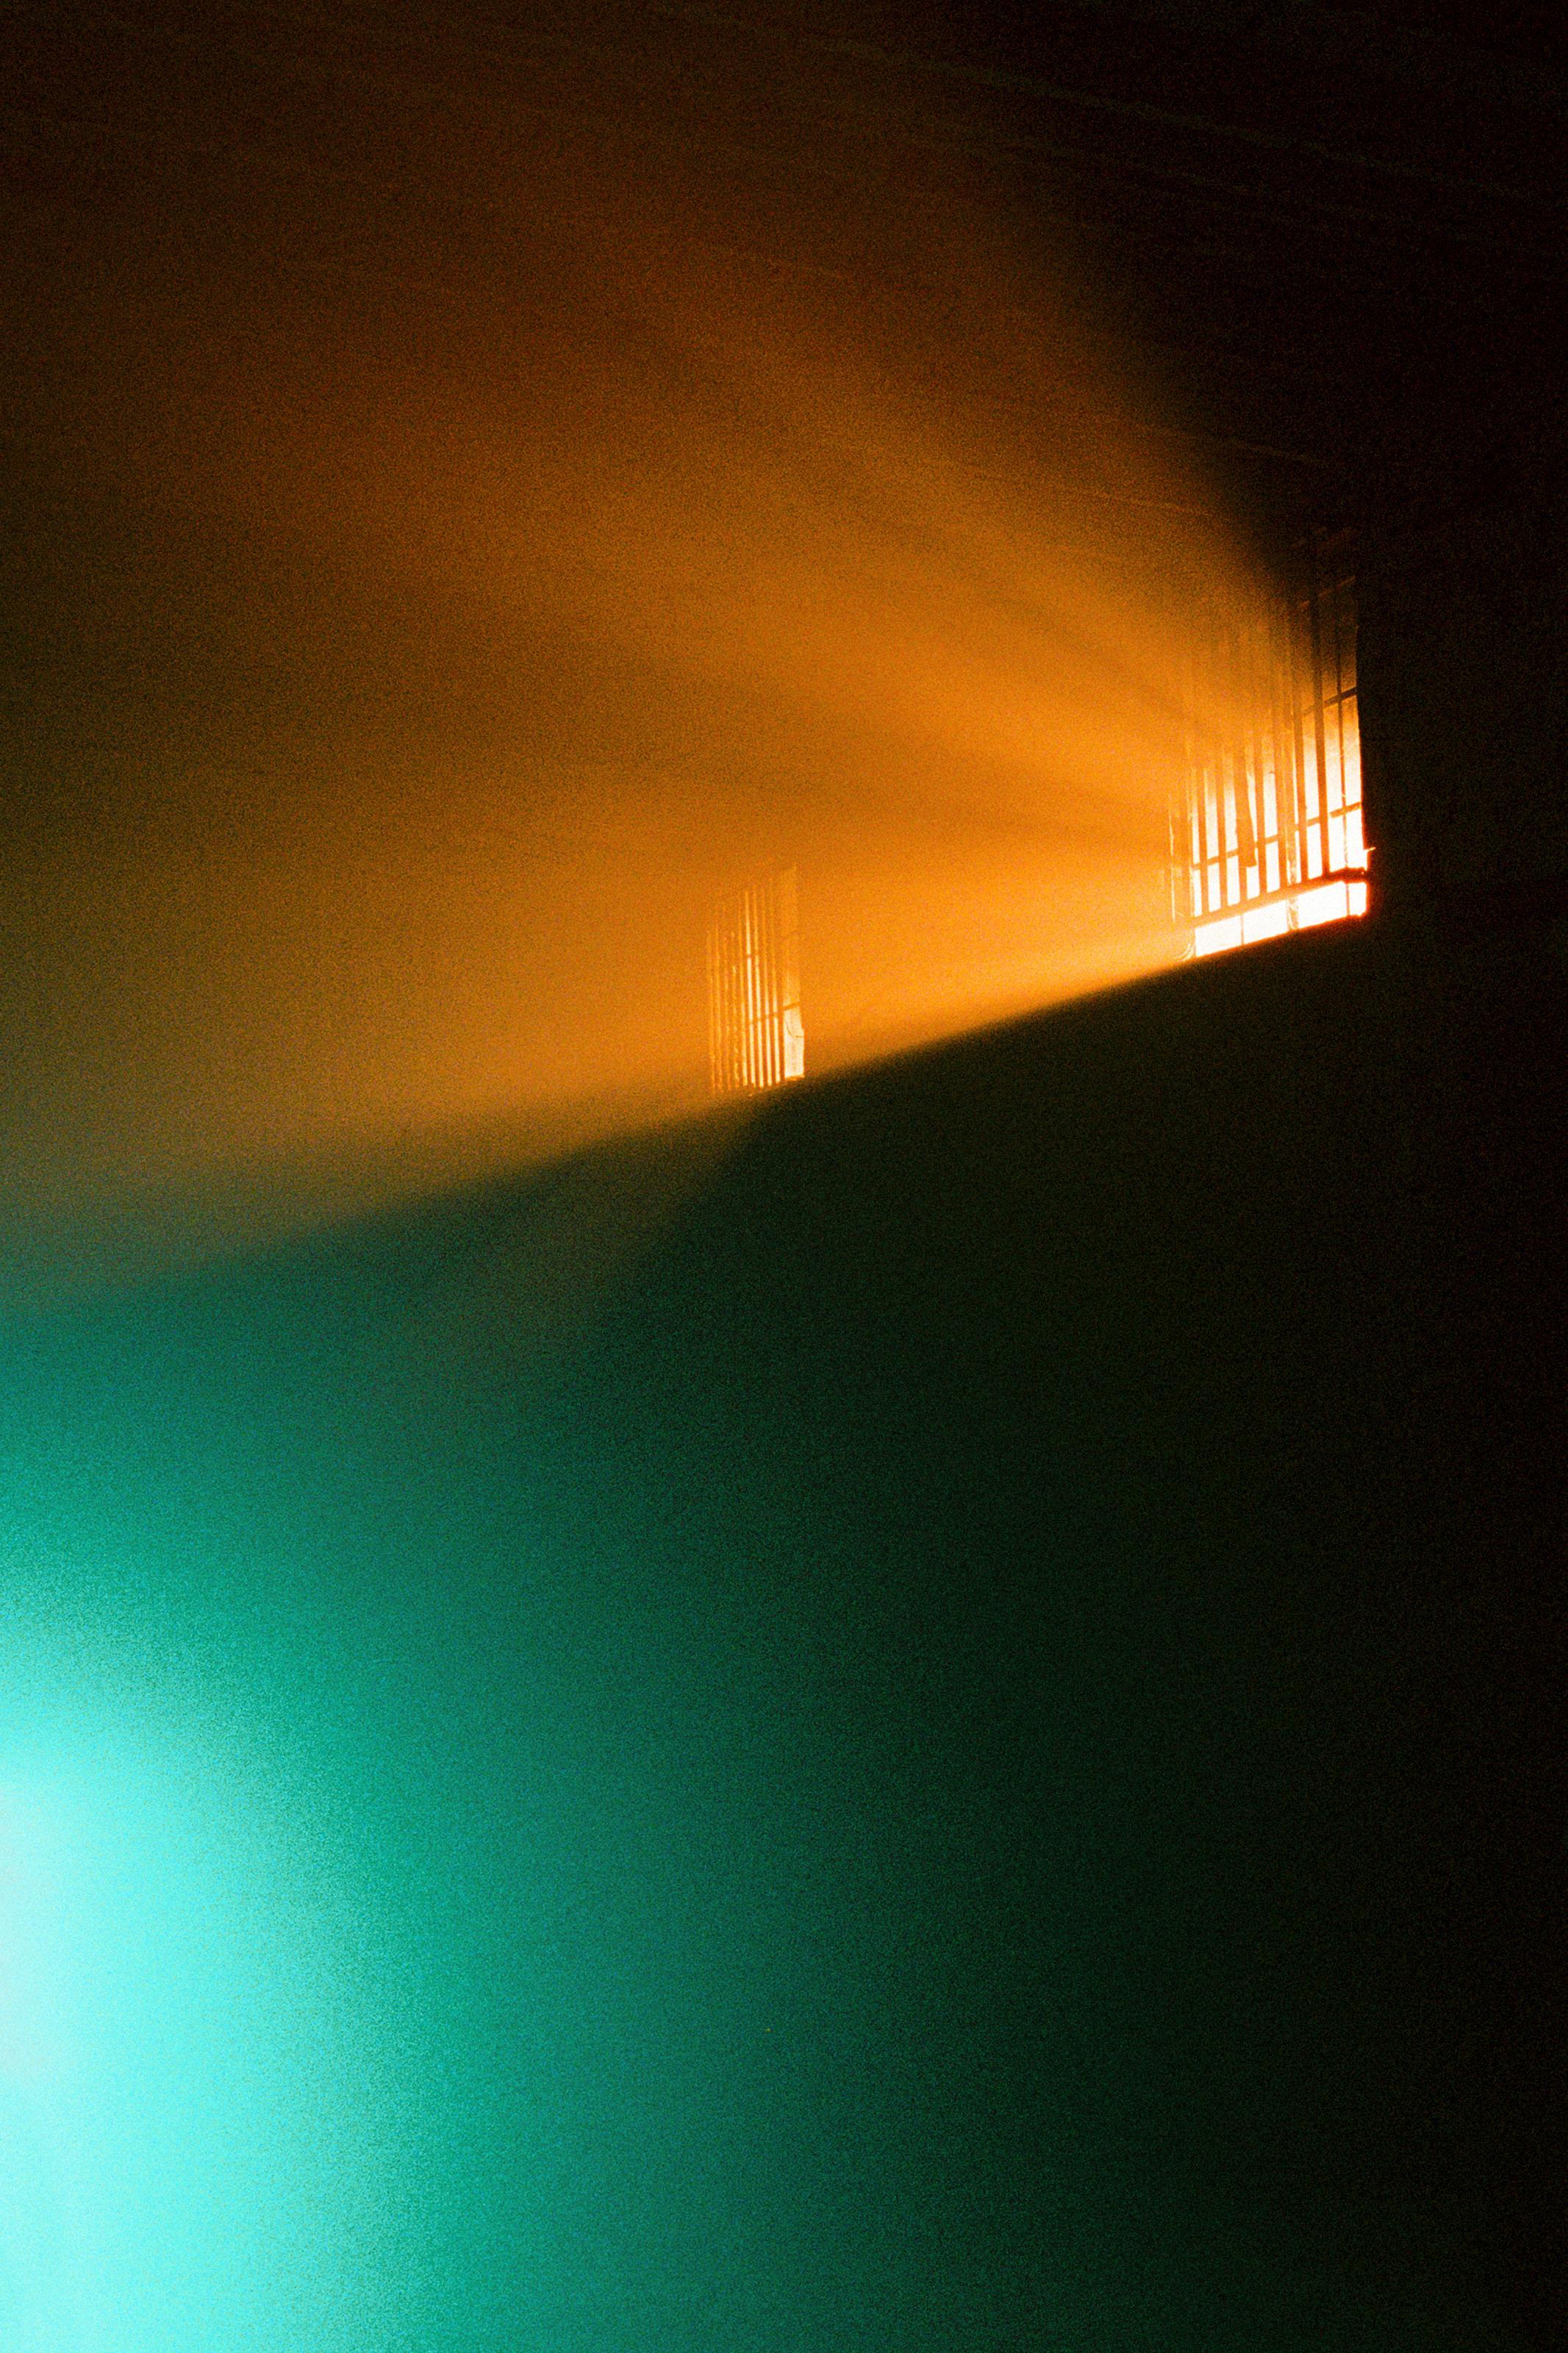 """Proxima"" Original photography 40"" x 30"" inch Ed. 1/3 by Larsen Sotelo"